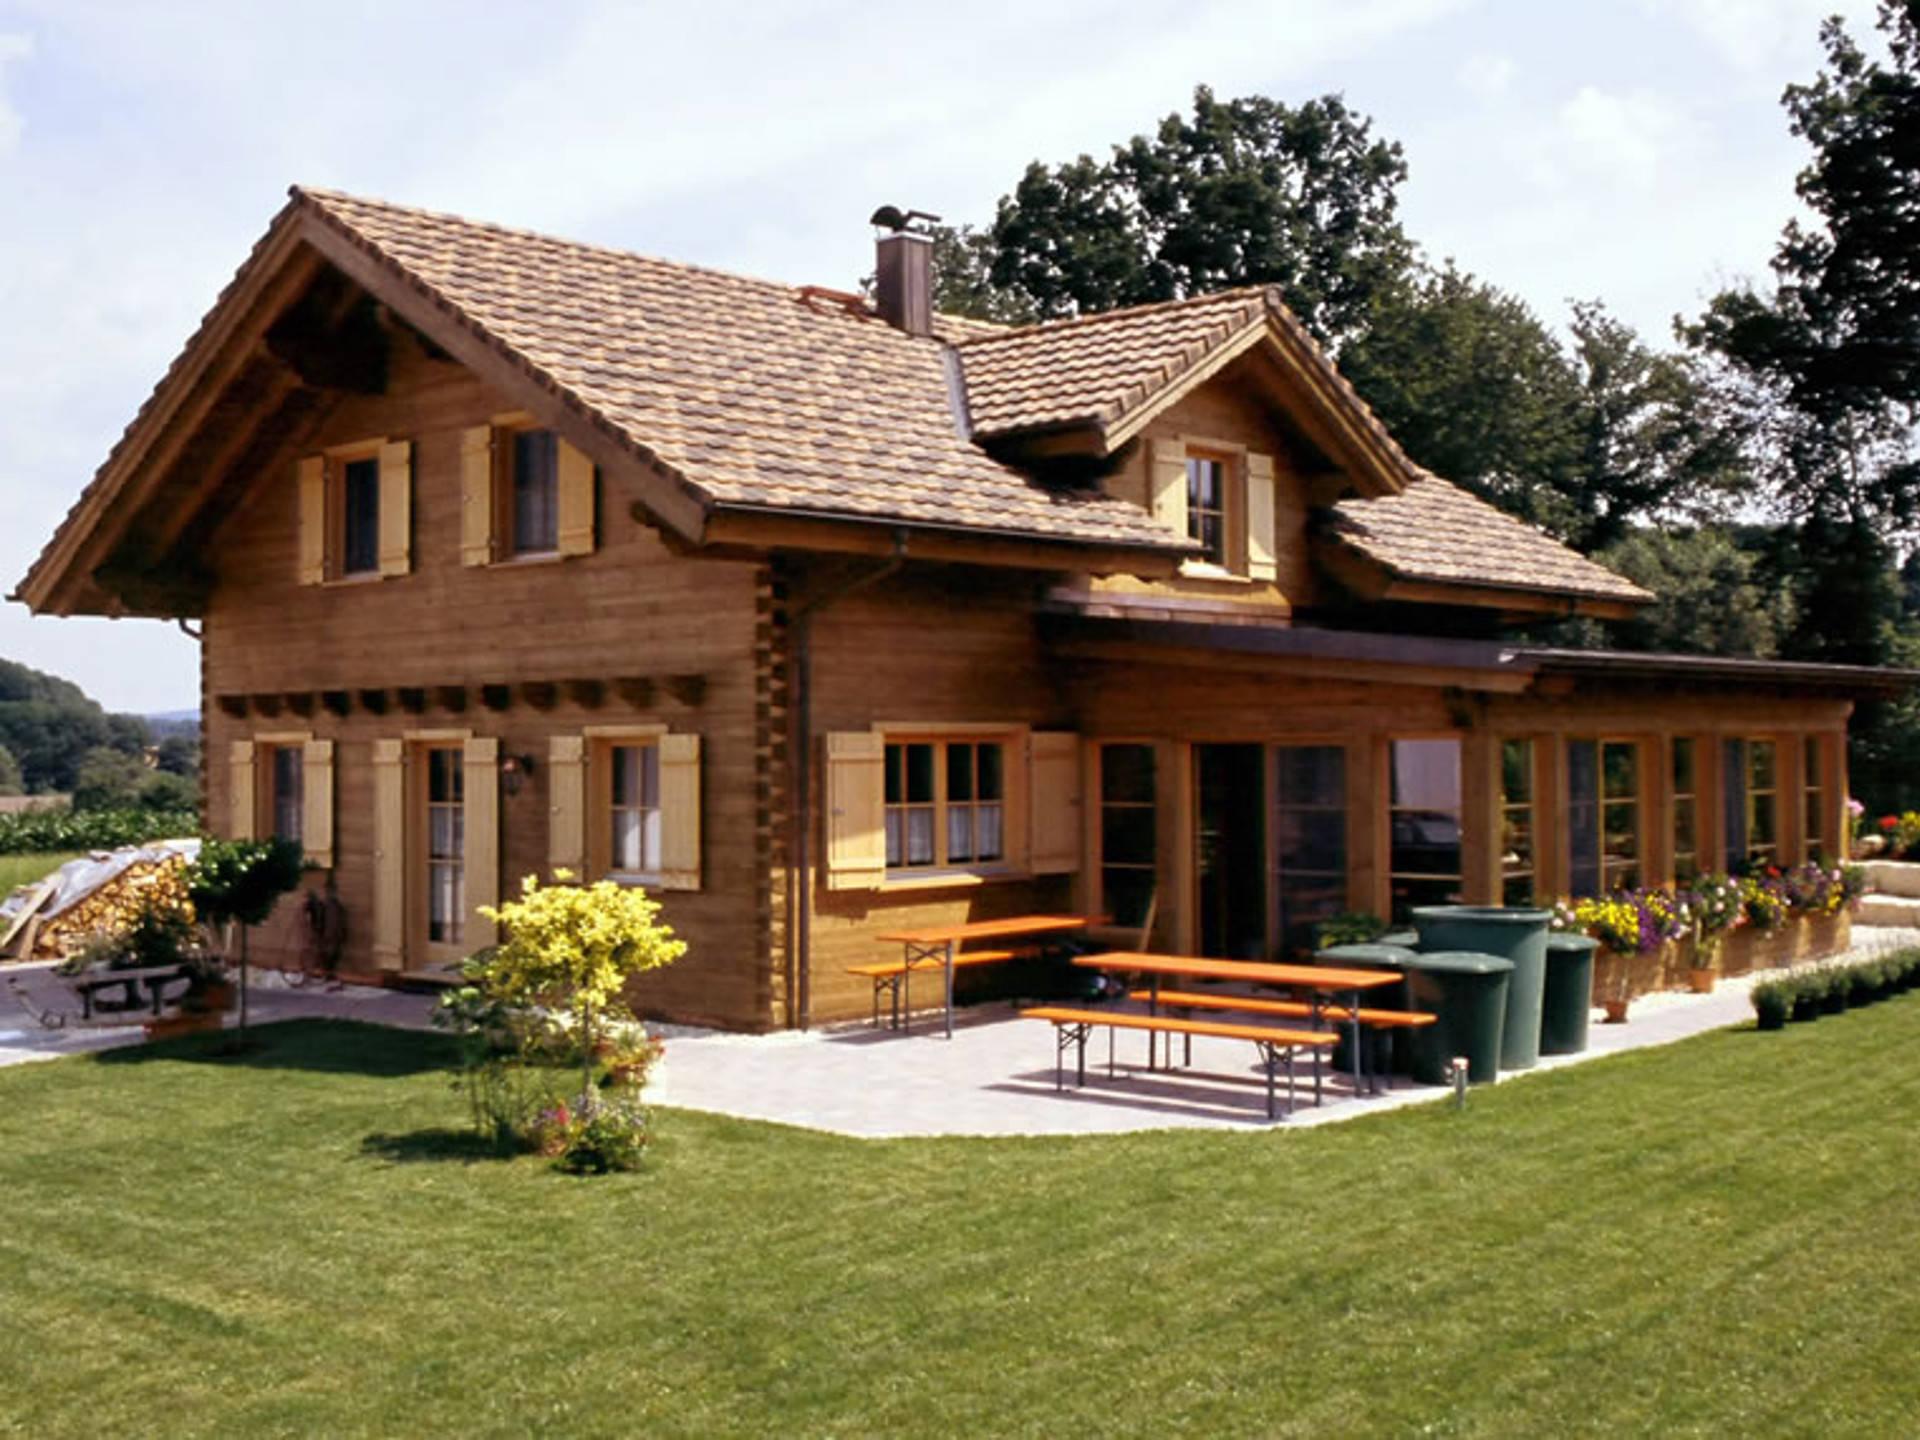 Rosskopf Holzhaus haus zell holzhaus rosskopf